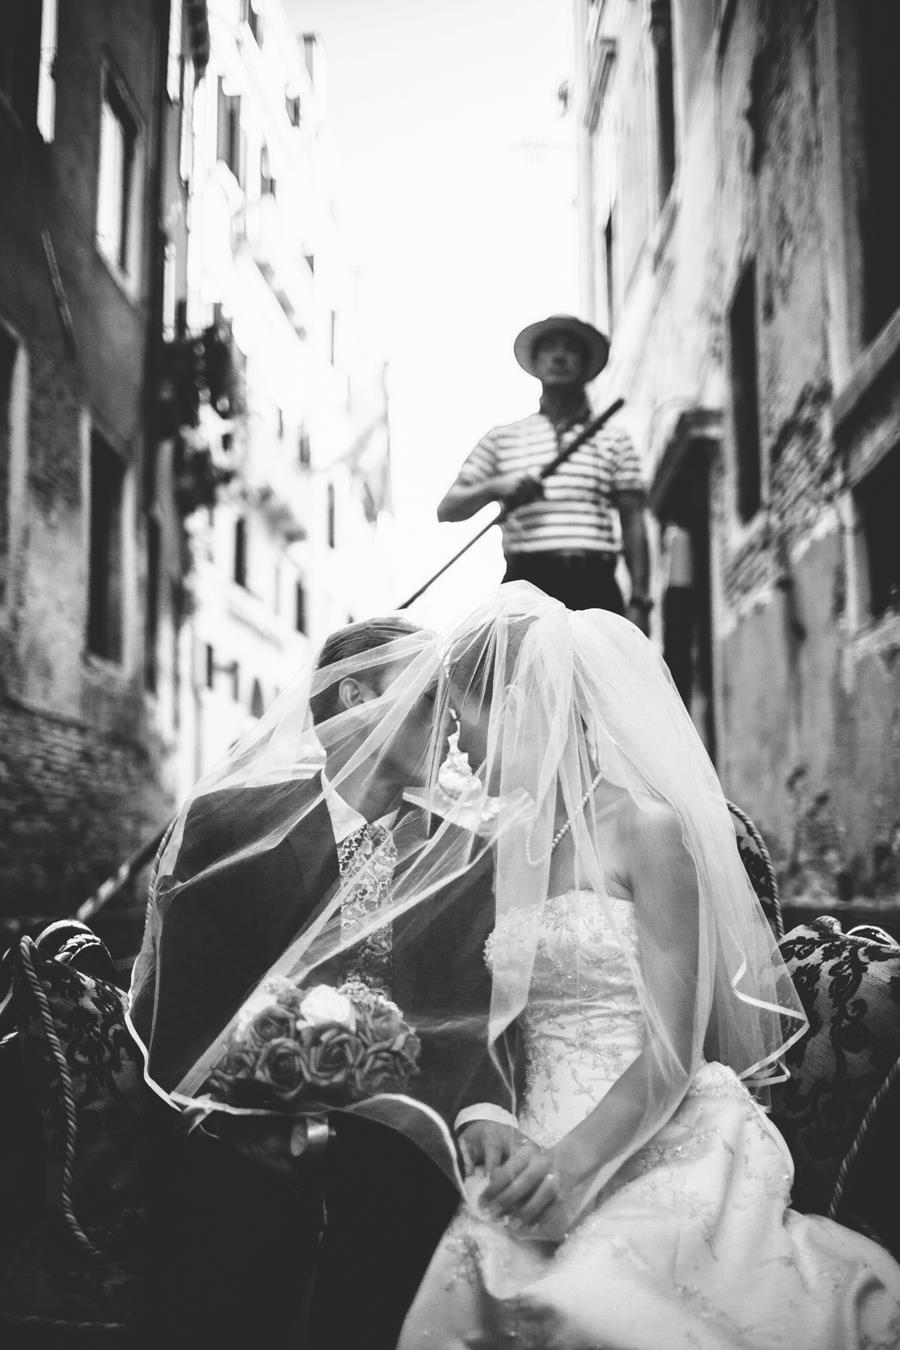 Venice wedding photographer – on the gondola